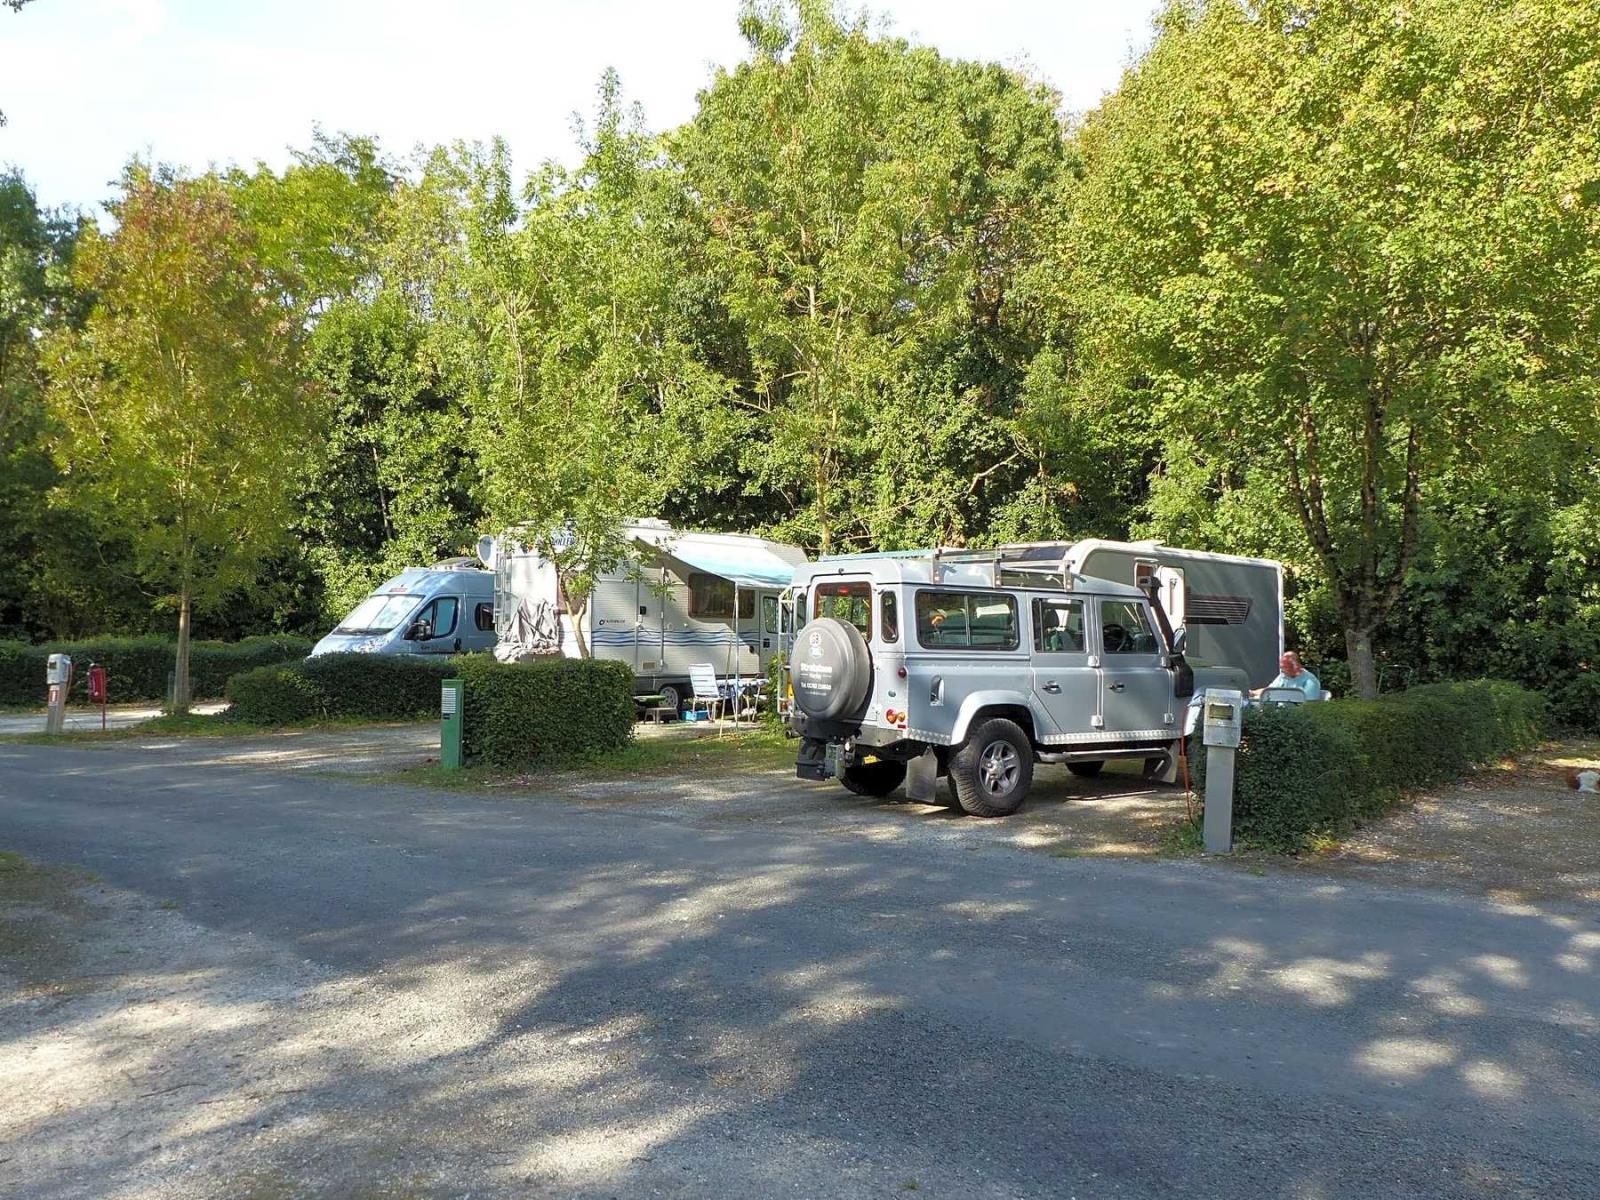 Emplacement - Forfait Nature (1 Tente, Caravane Ou Camping-Car / 1 Voiture) - Camping Le Bois Dinot